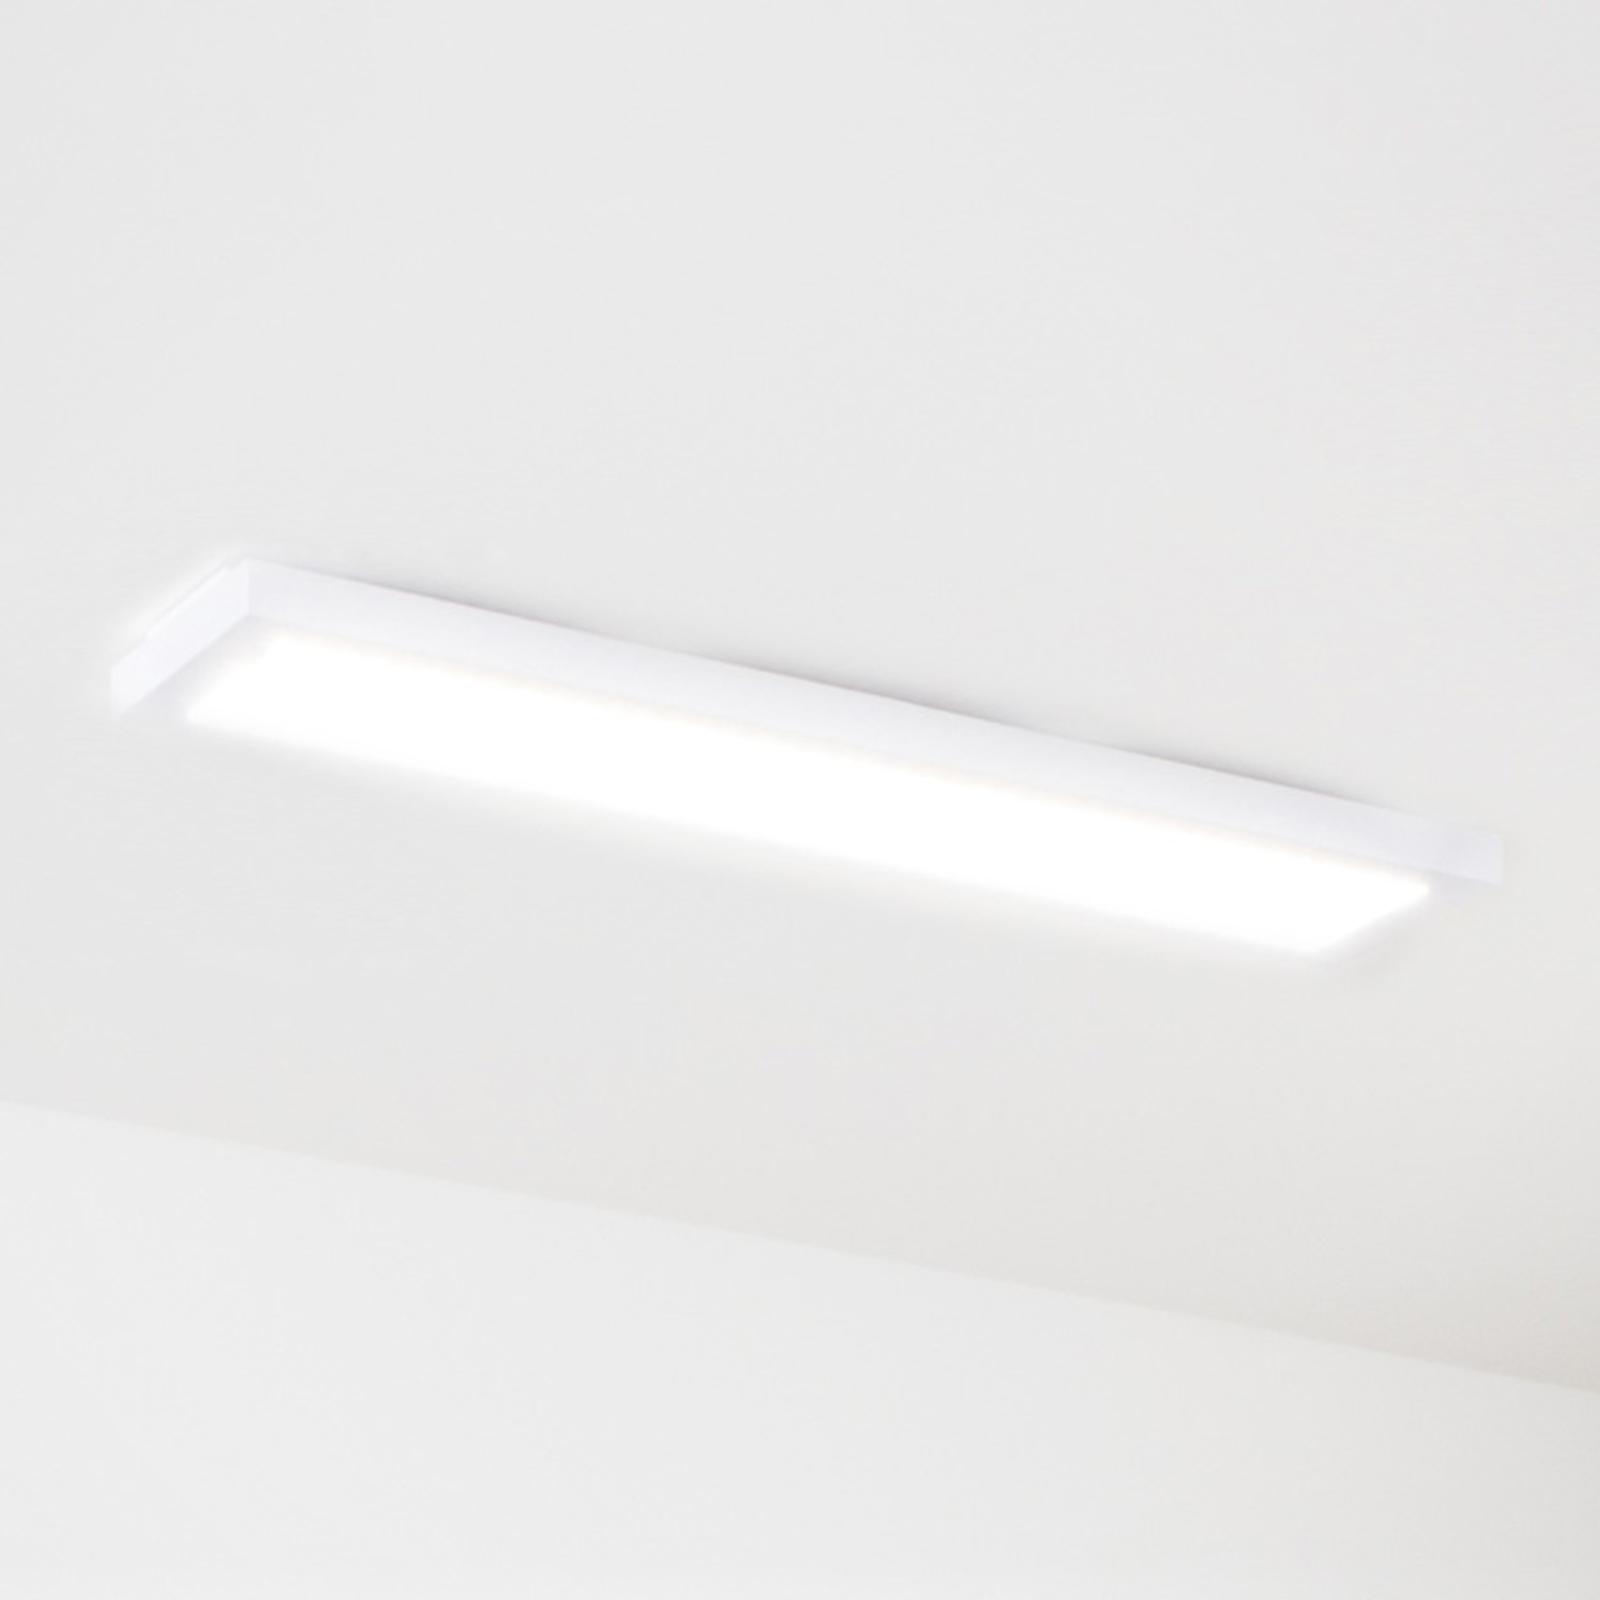 Lampa sufitowa LED Memo DIM 90, uniwersalna biel